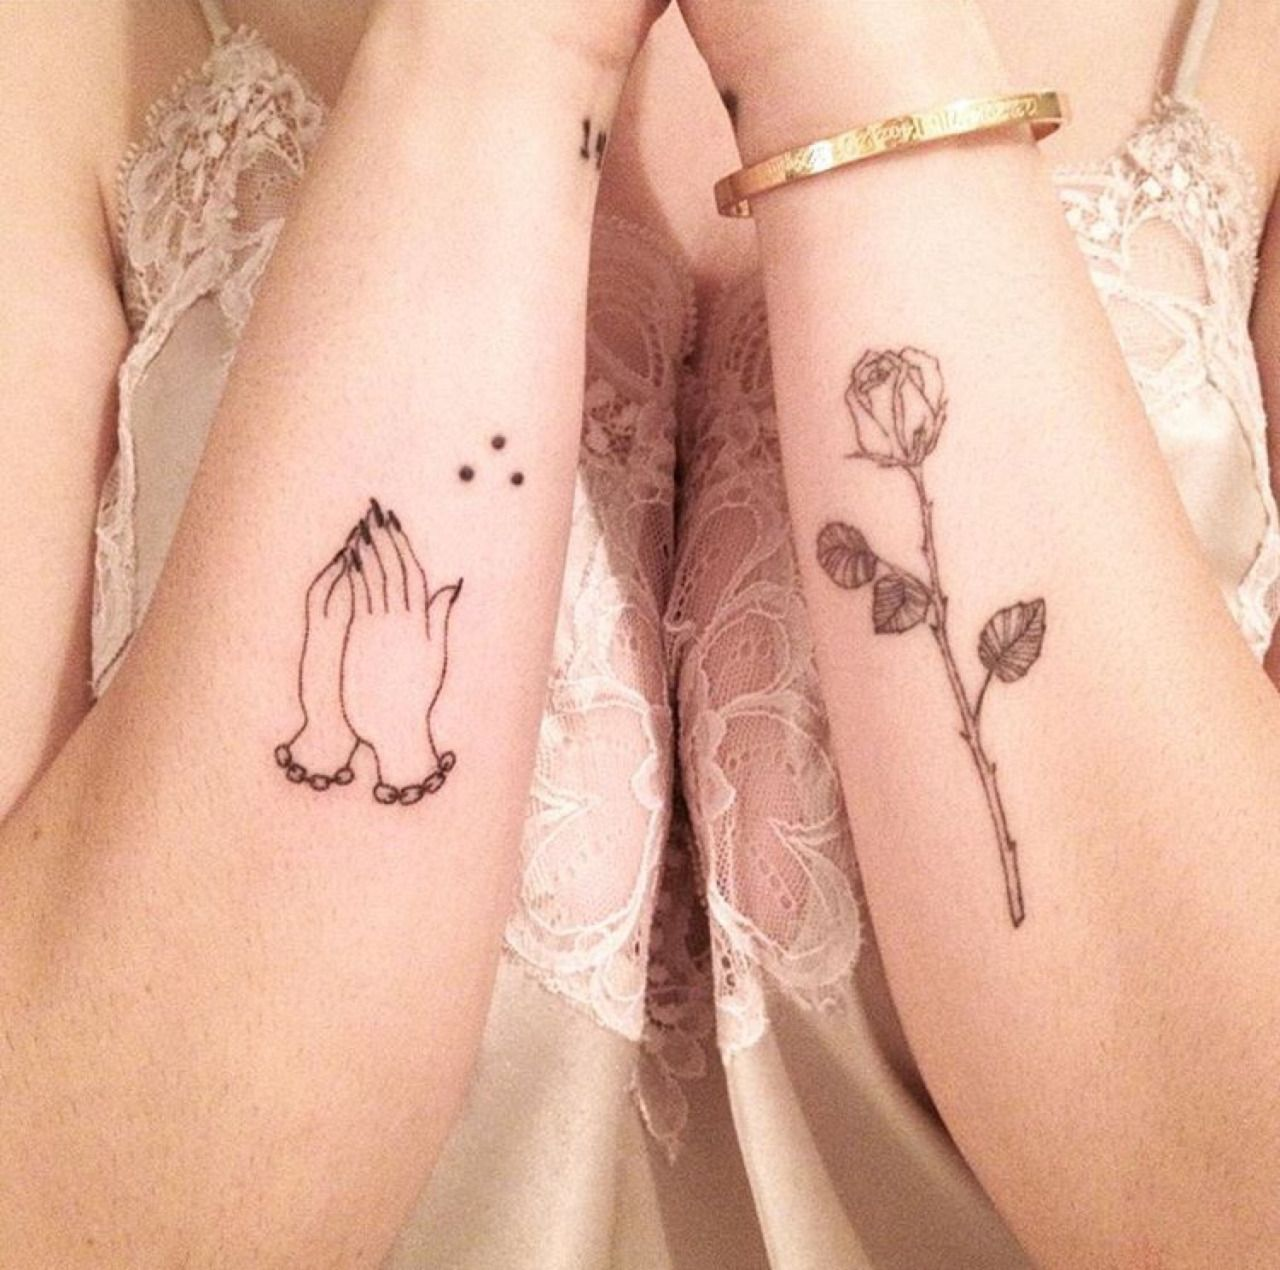 Stick And Poke Tumblr Hand Tattoos Small Hand Tattoos Prayer Hands Tattoo